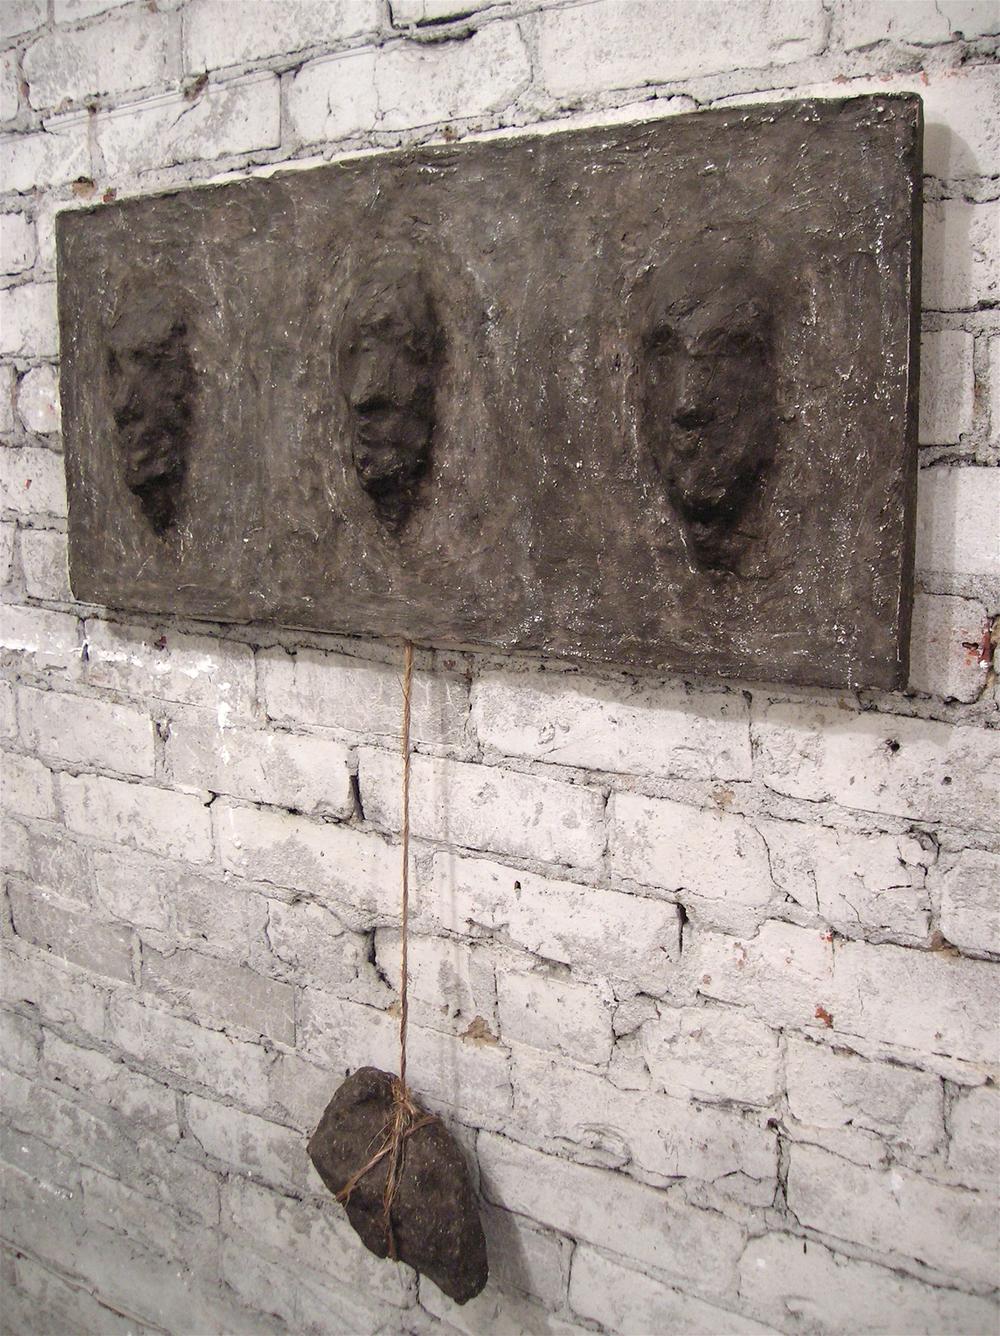 3 Faces - A Stone